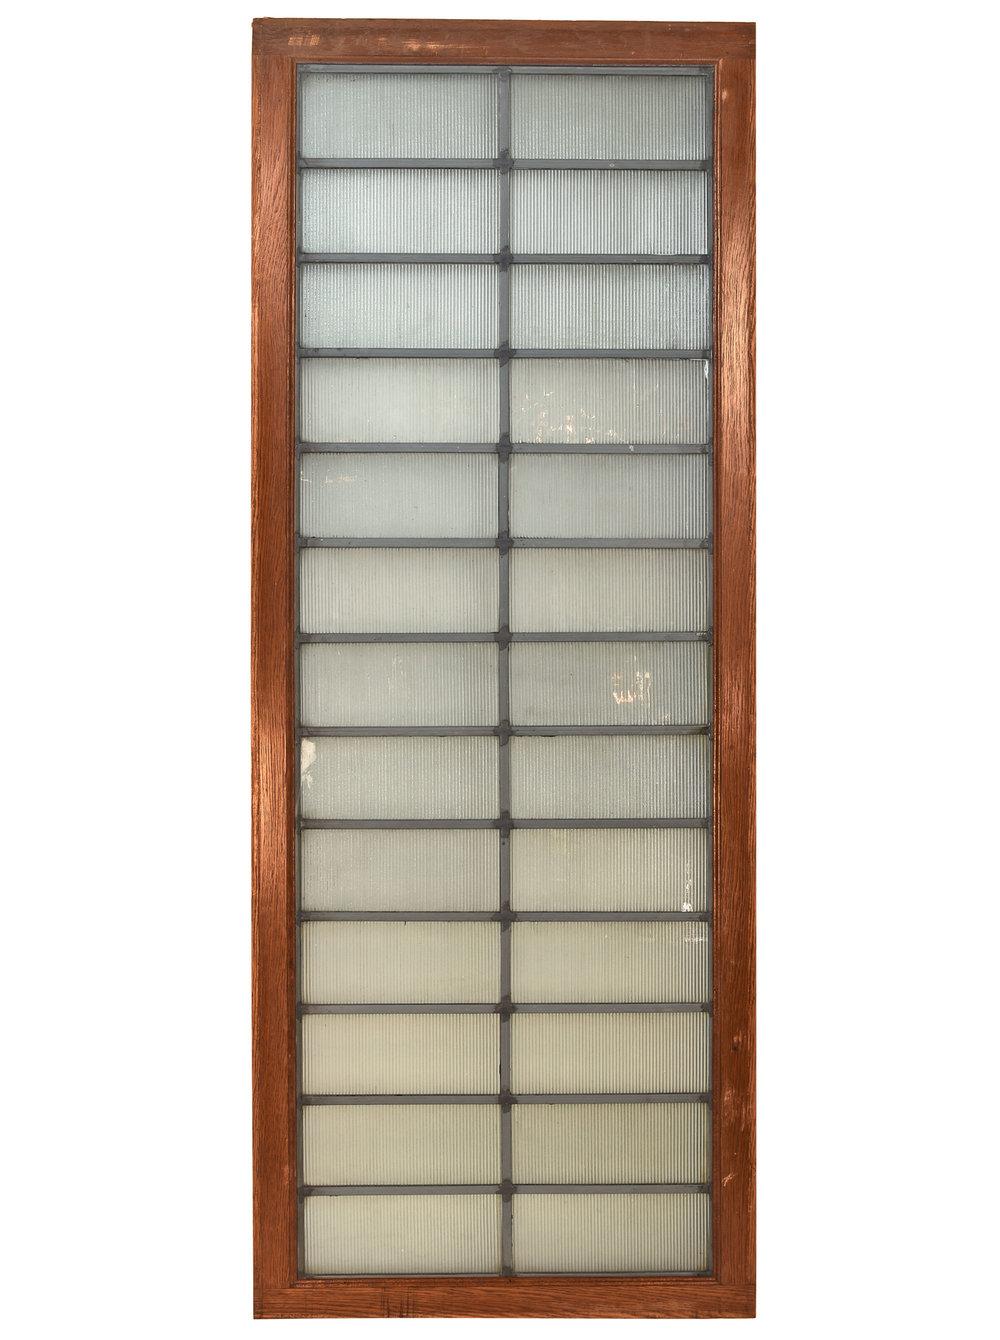 46641-large-warehouse-window.jpg